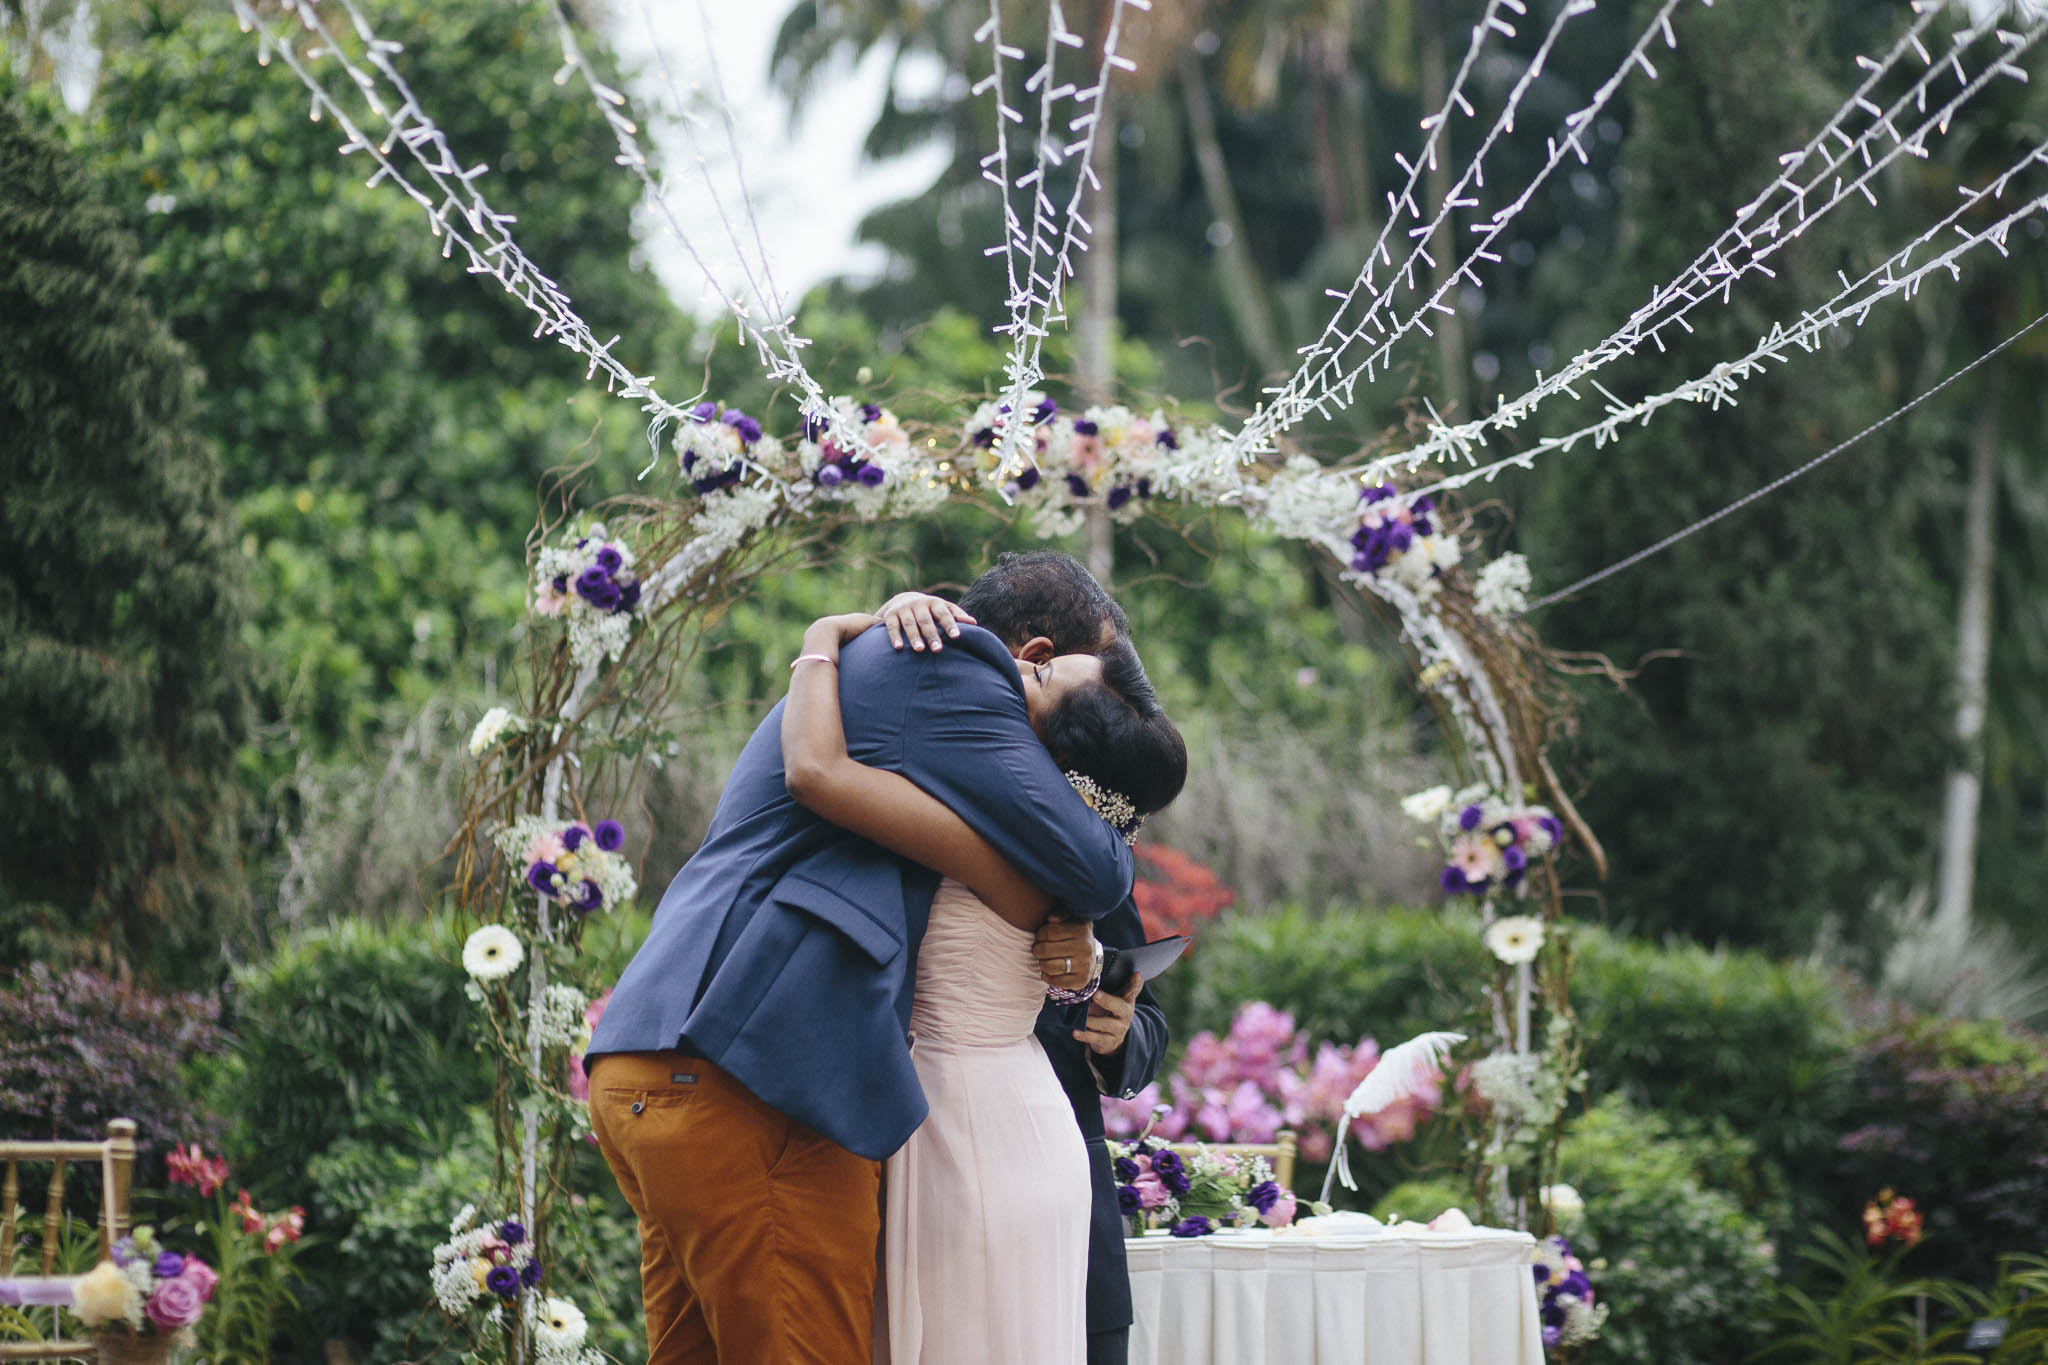 singapore-wedding-photographer-malay-indian-pre-wedding-travel-wmt-2015-68.jpg